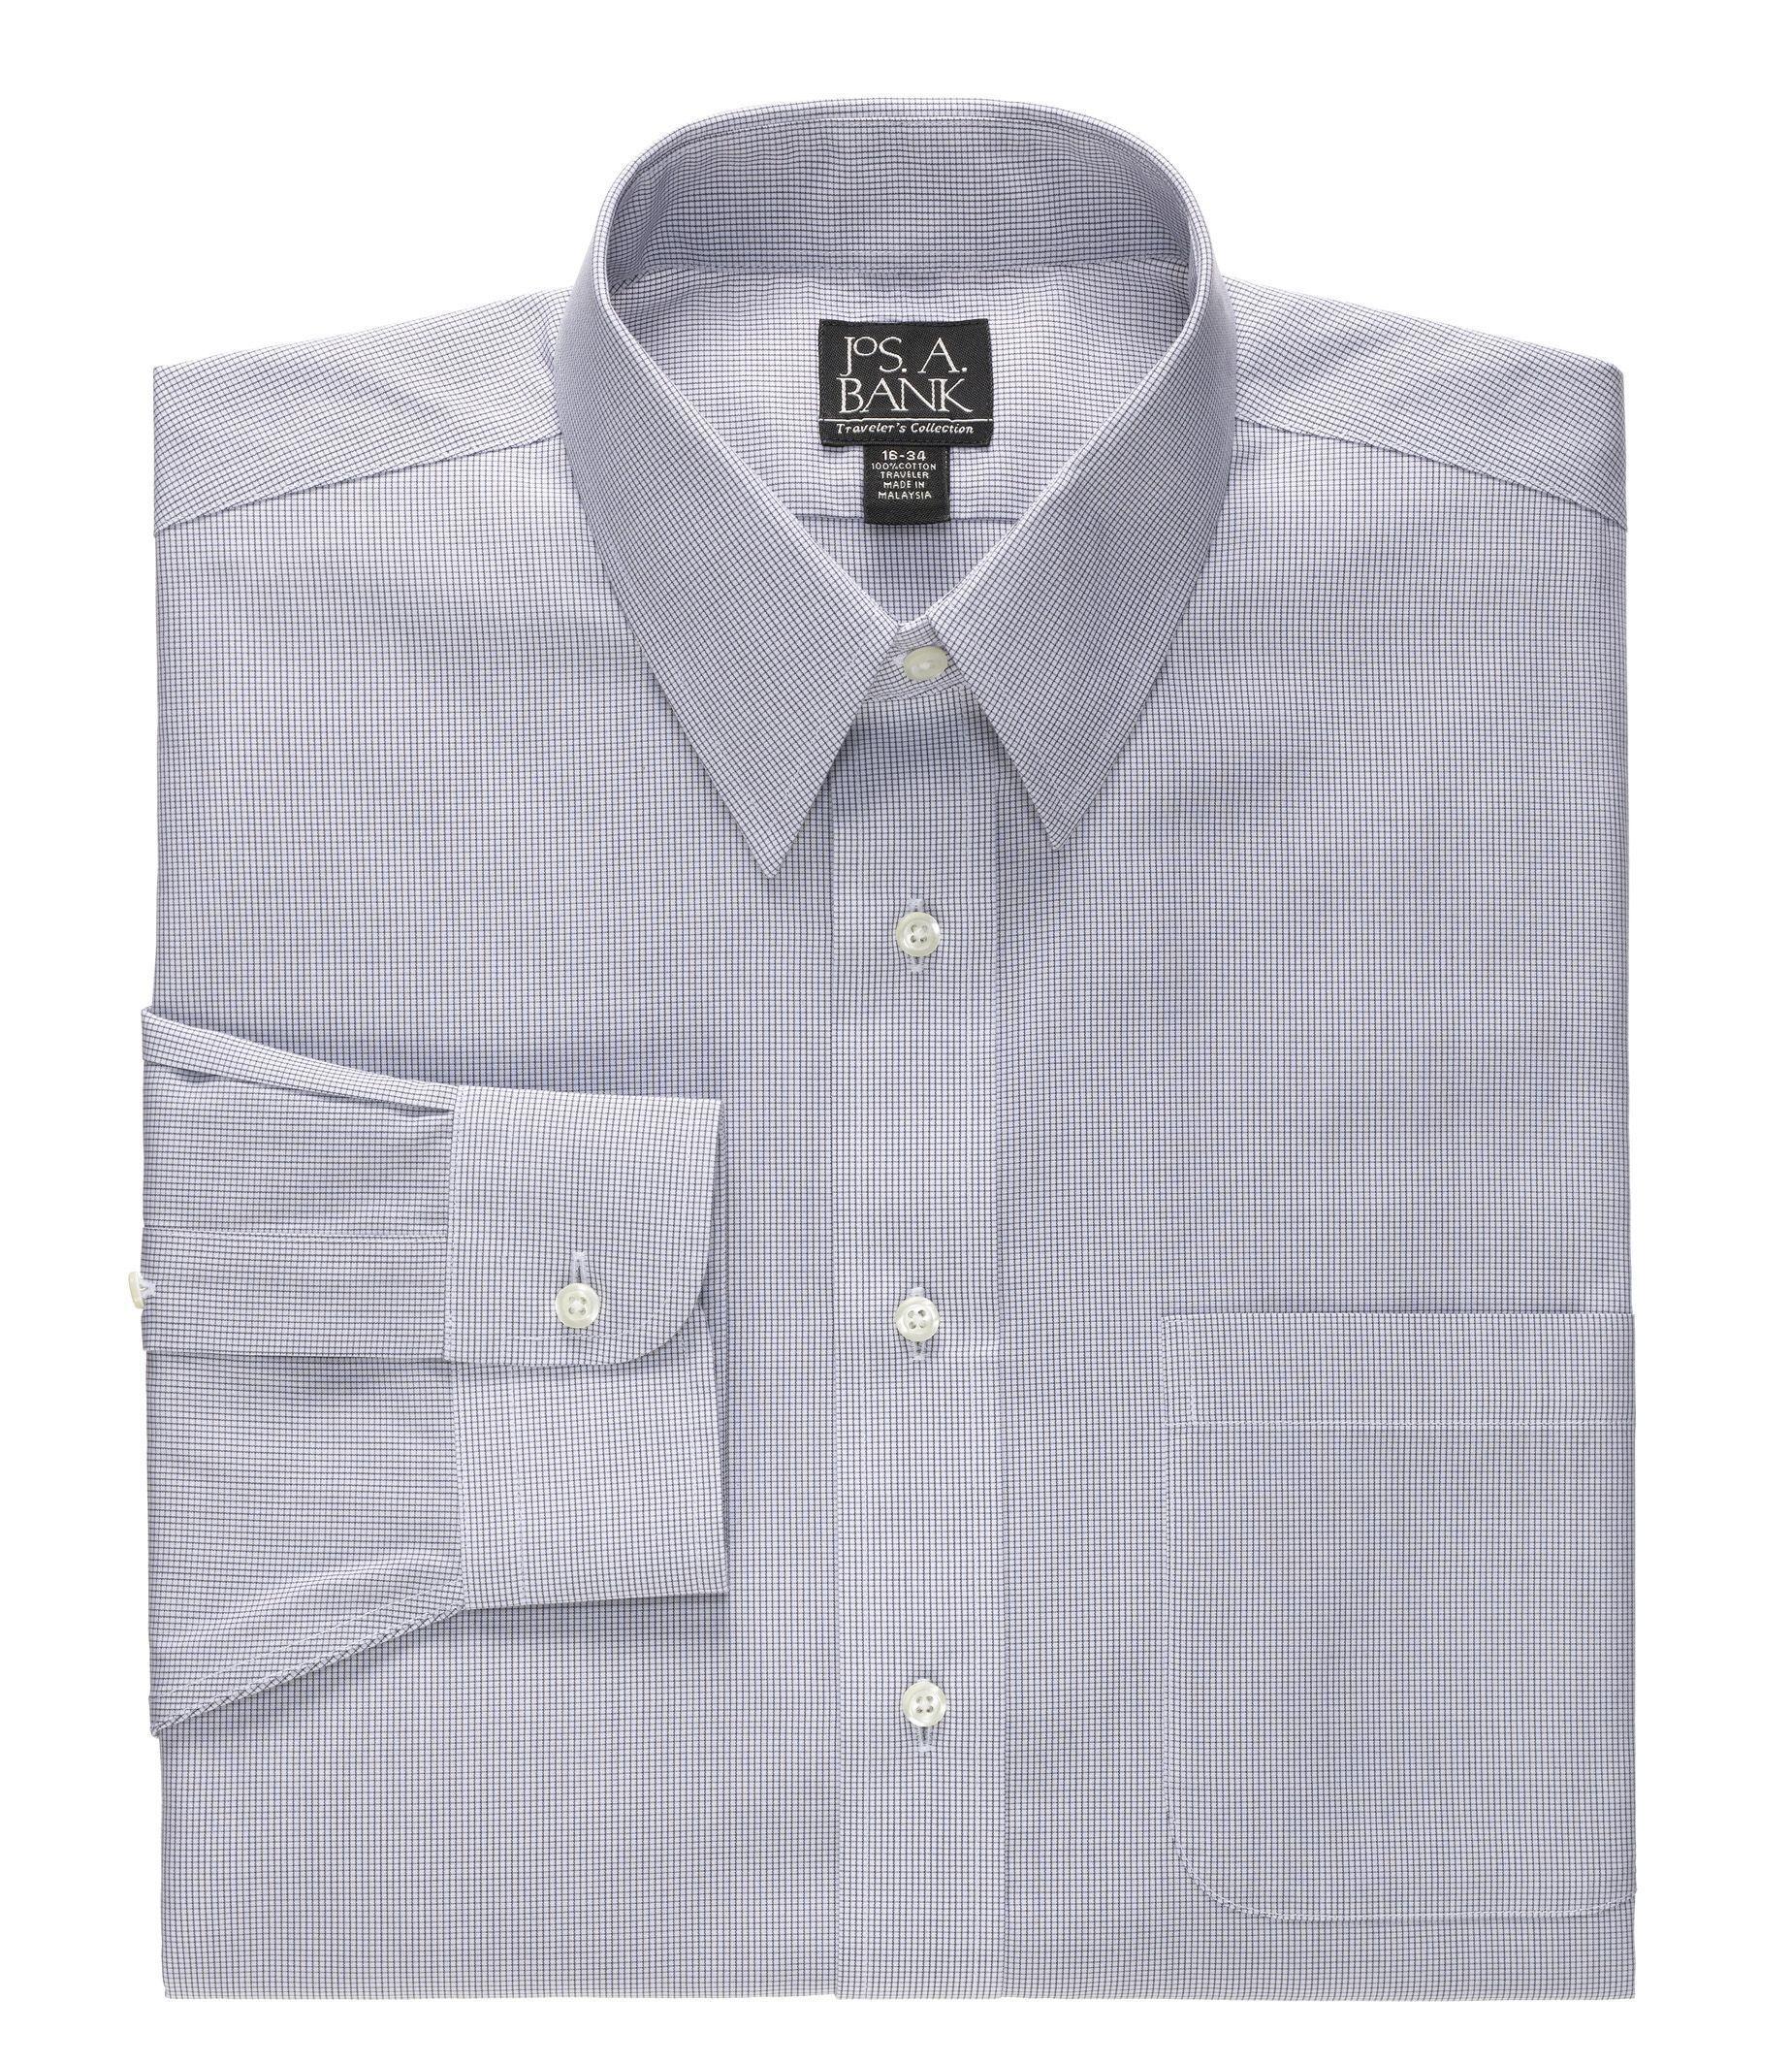 Traveler Slim Fit Long-Sleeve Point Collar Dress  Shirt                        L